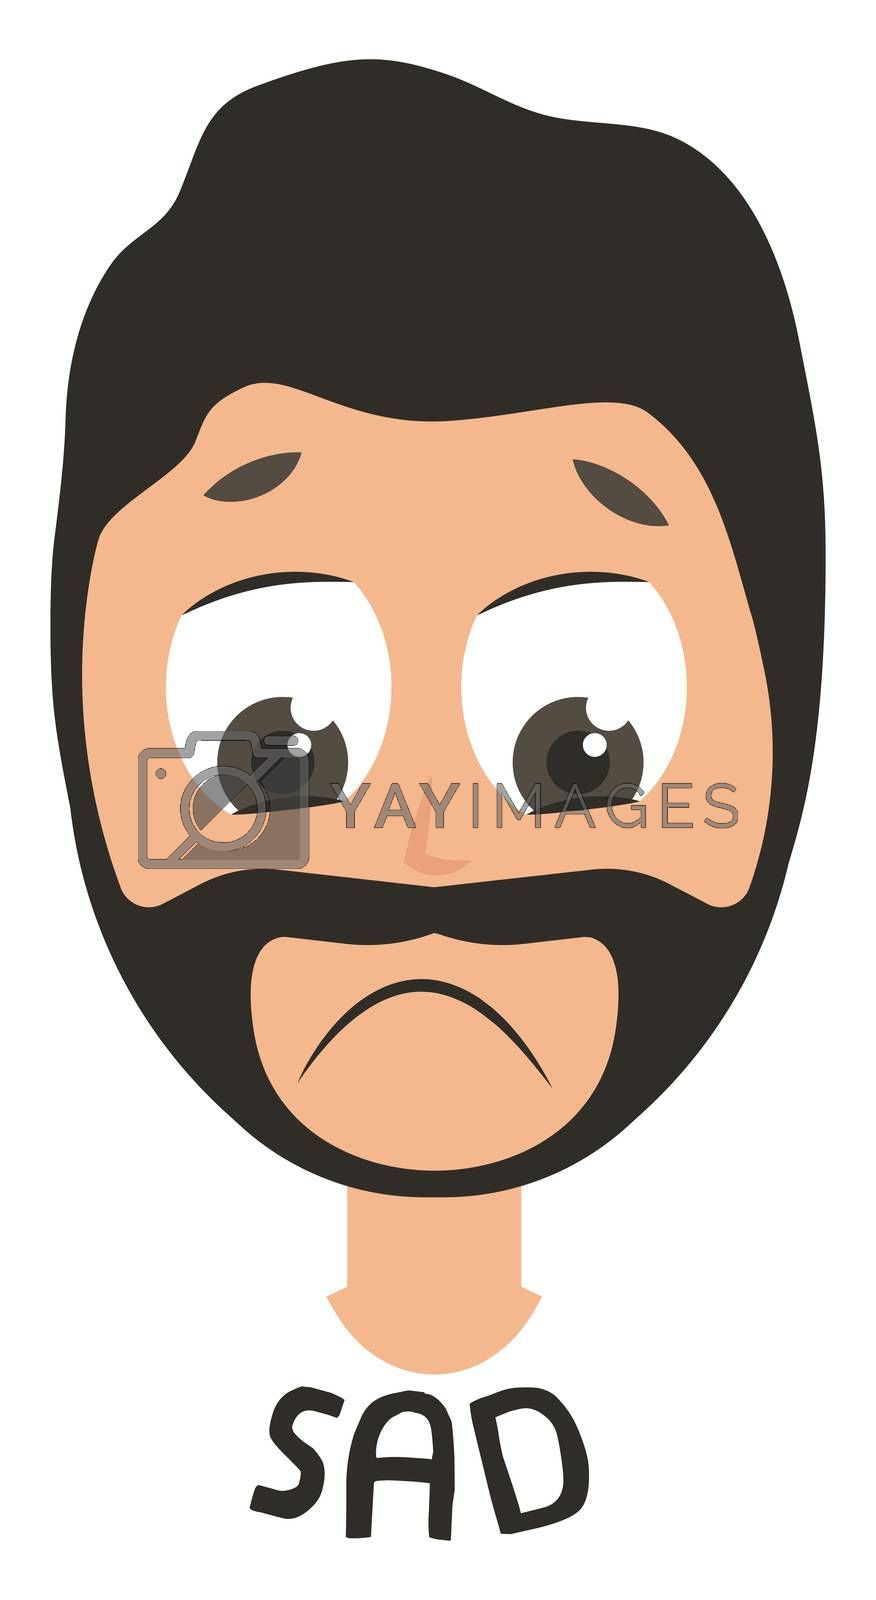 Sad man emoji, illustration, vector on white background